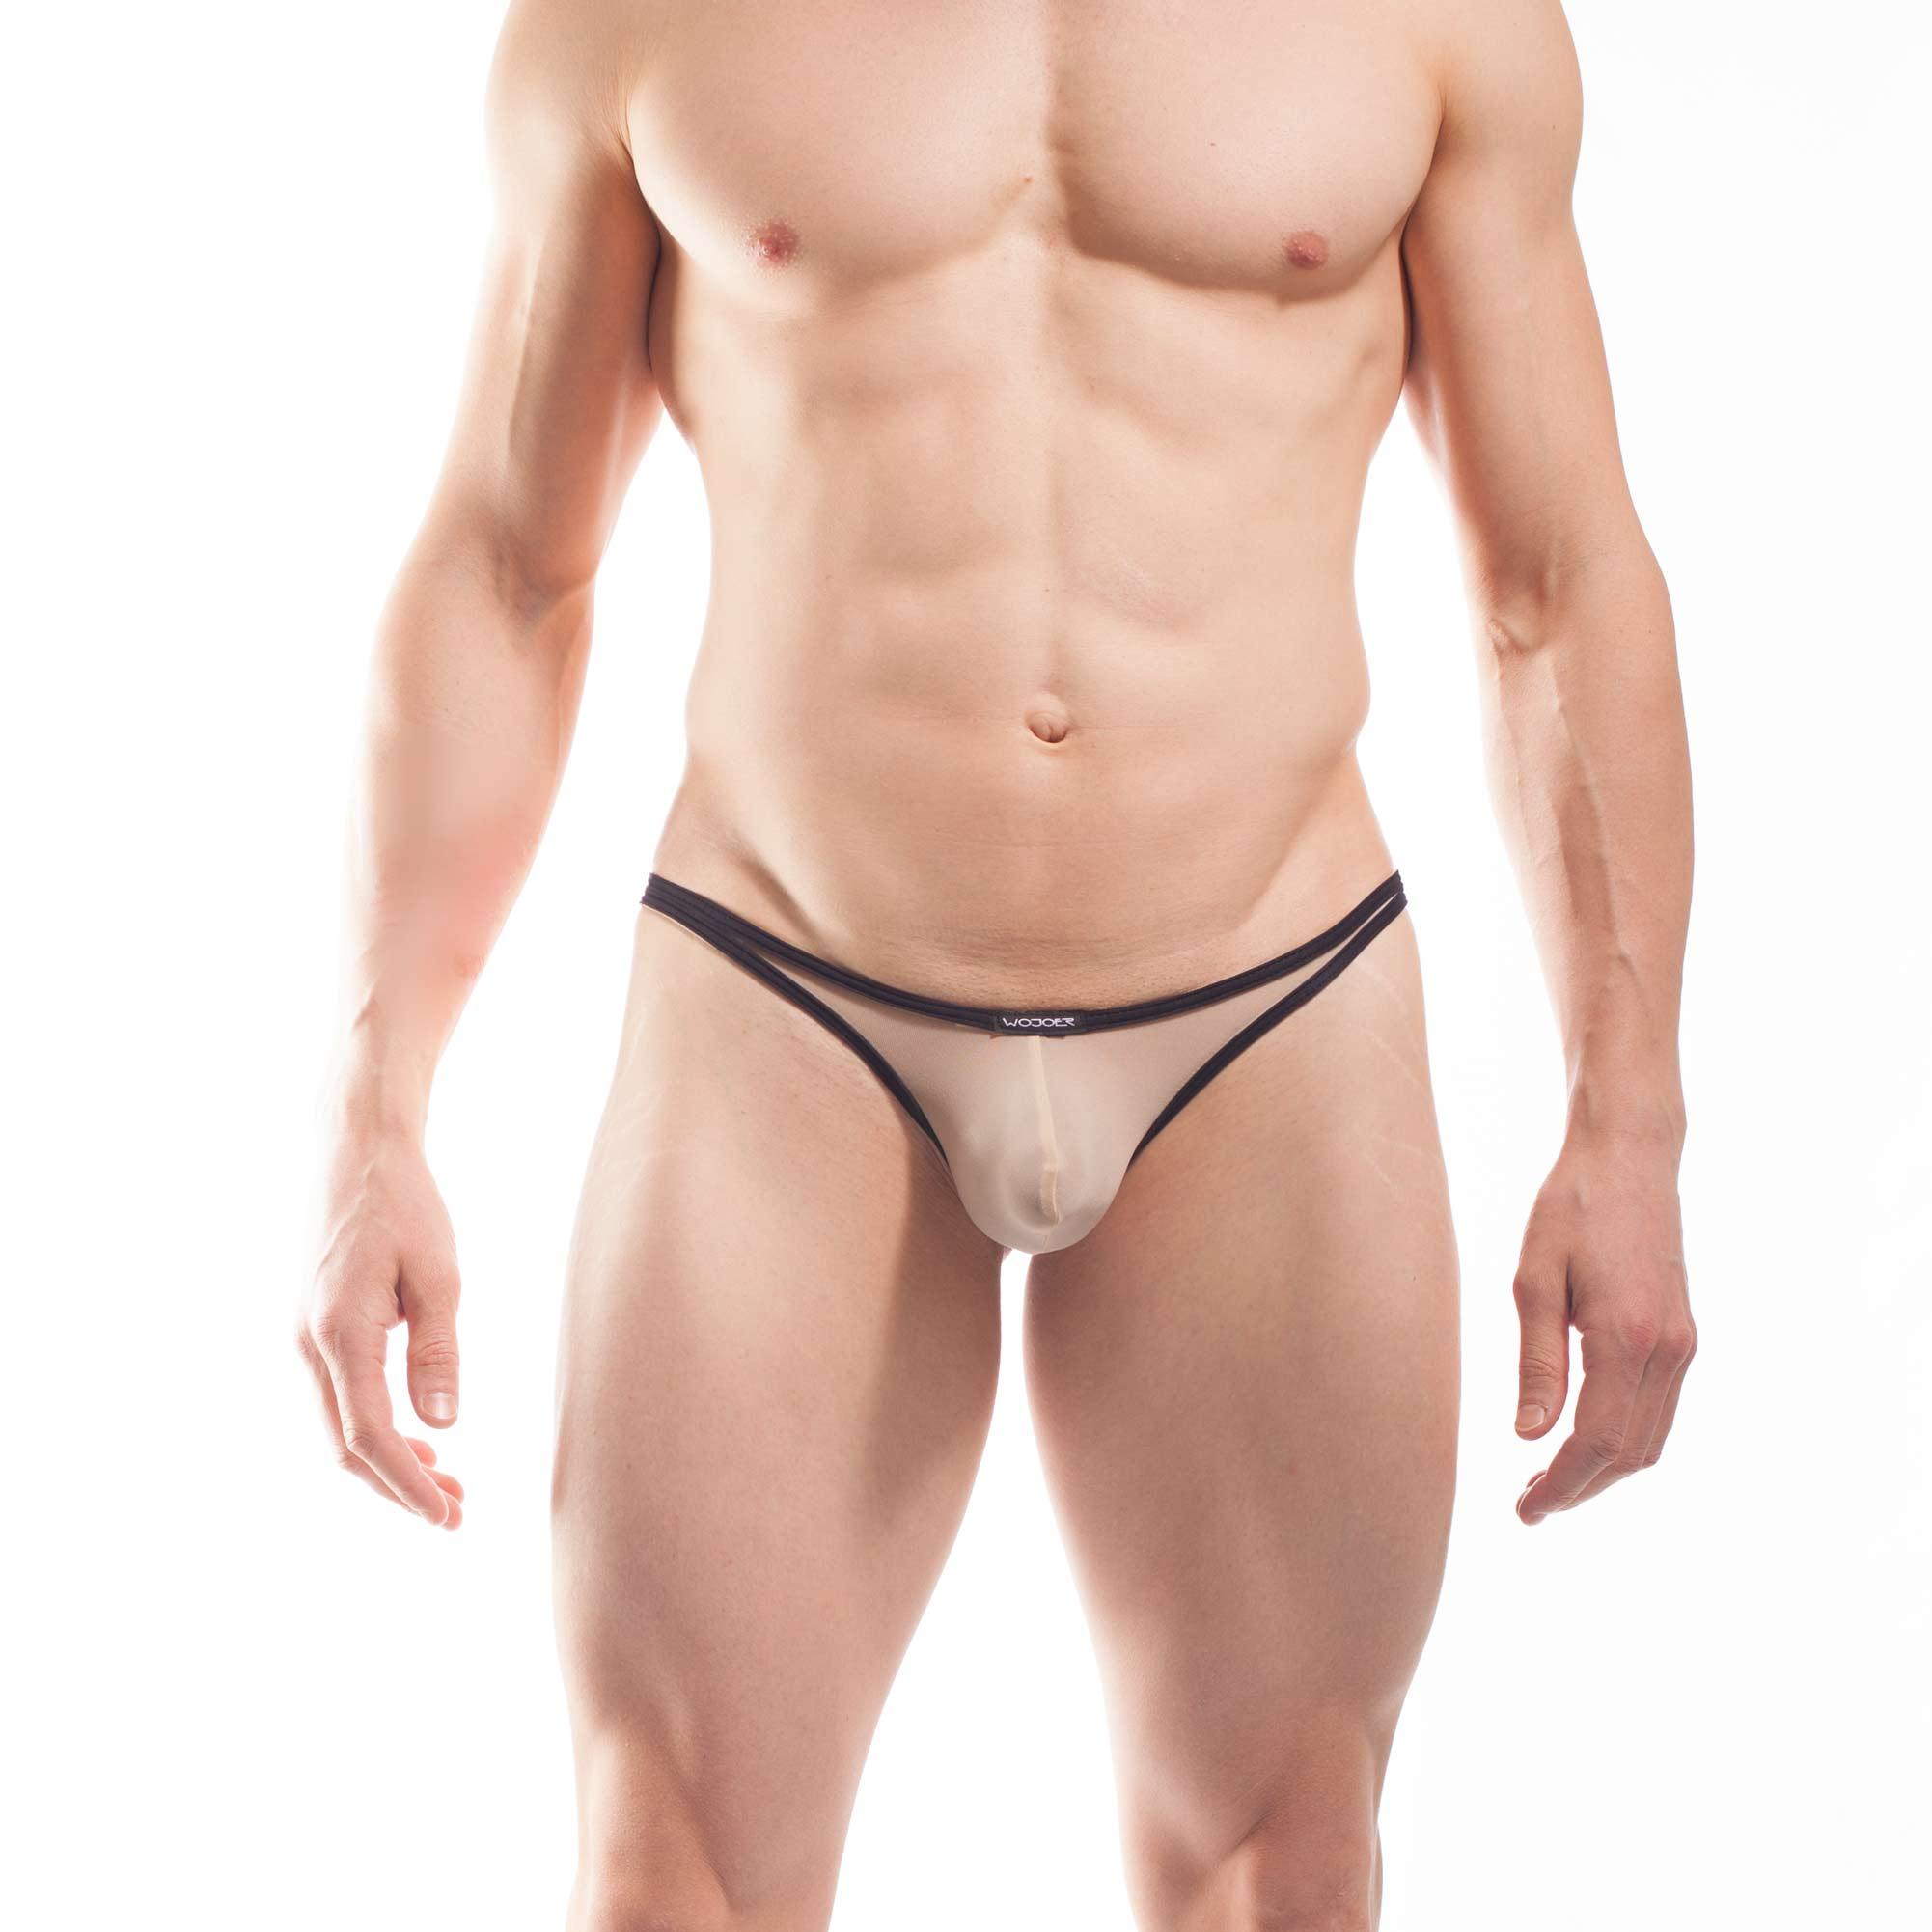 BEUN STRIPE PUSH UP MINI STRING, String, Tube, knappe Badehose, swim trunks, kontrast Ränder, schwarze Börtchen, nude, hautfarben, haut